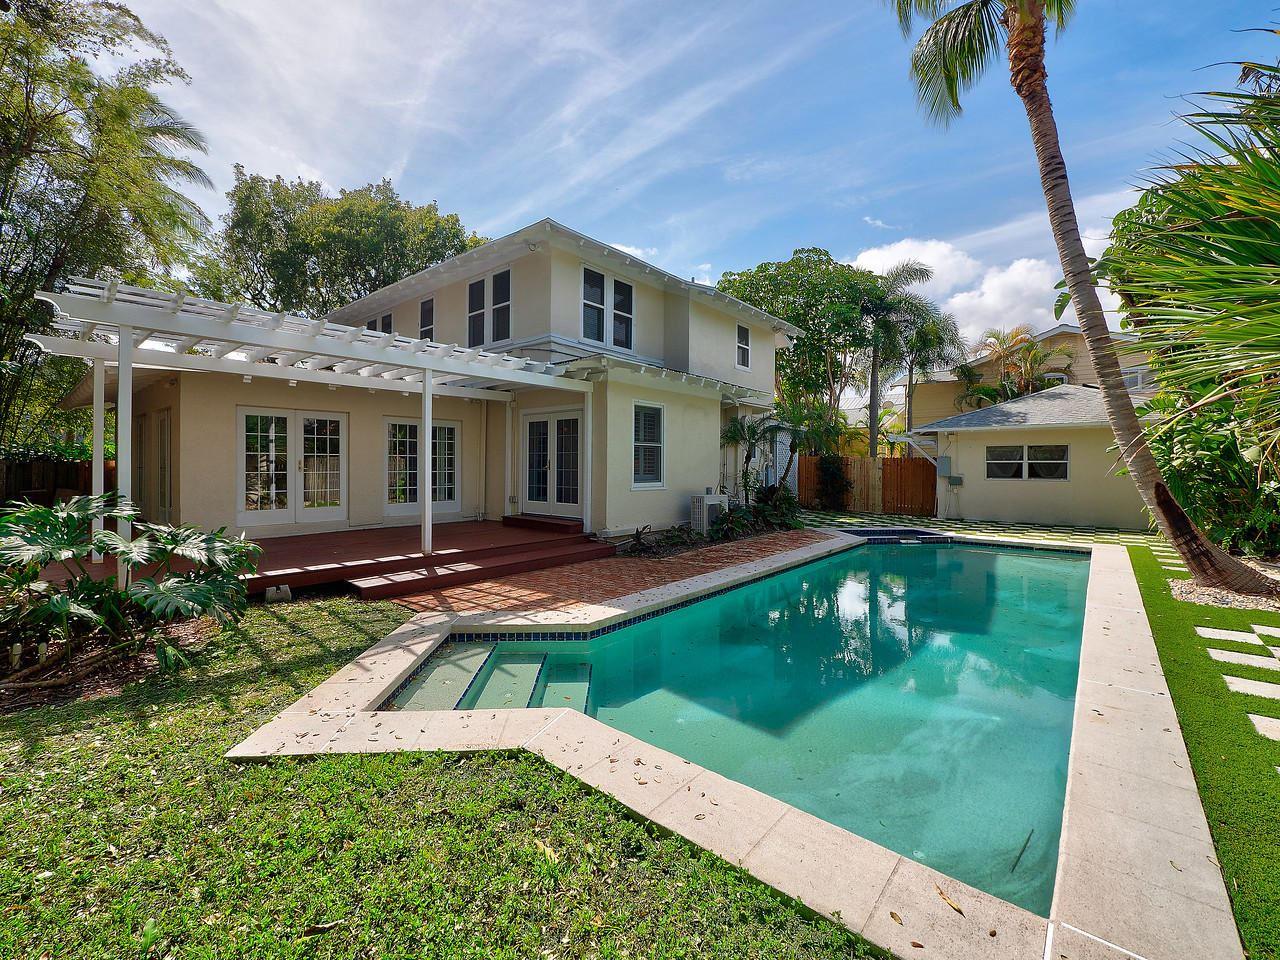 307 Wildermere Road, West Palm Beach, FL 33401 - #: RX-10602742